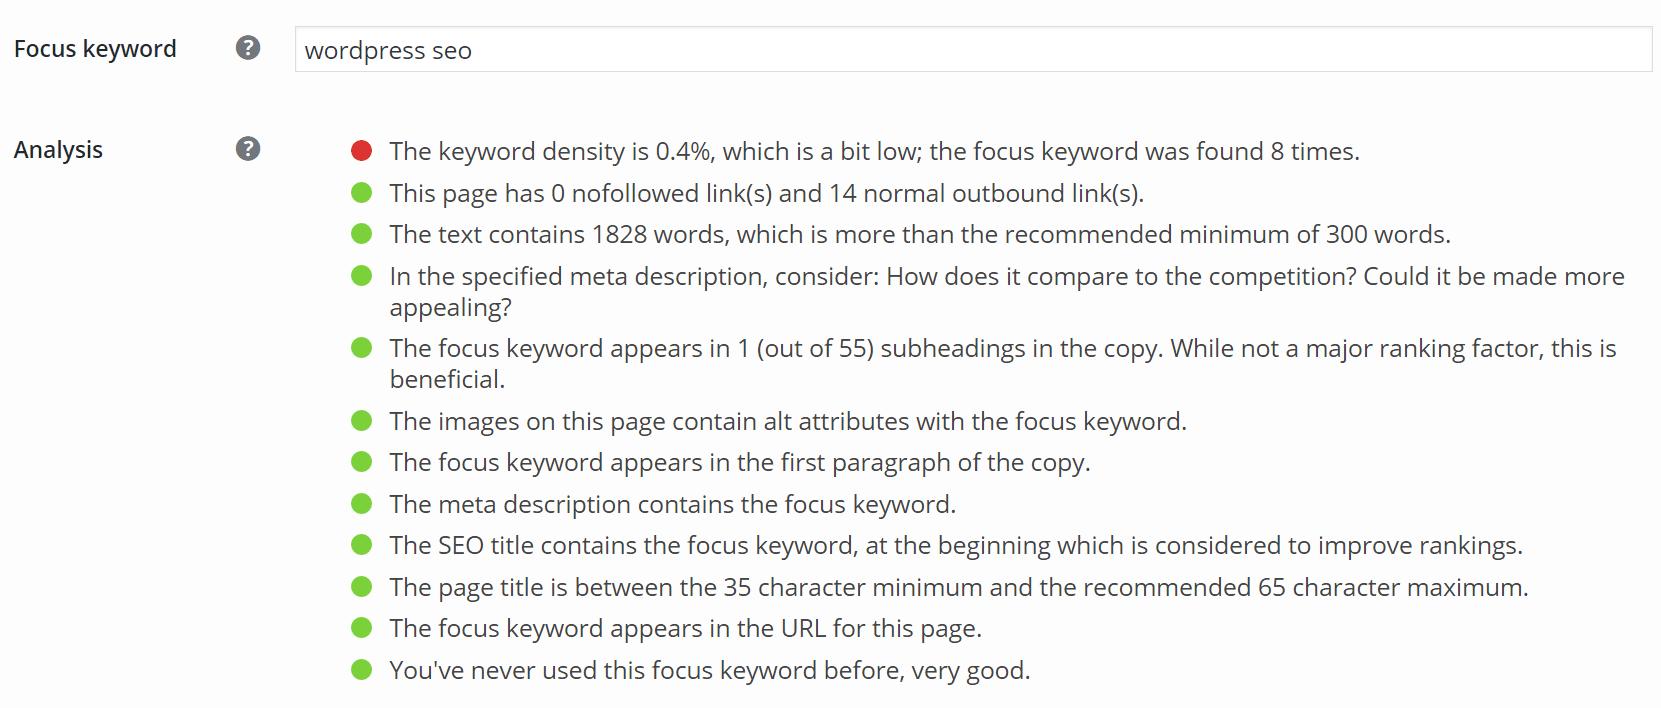 Parola chiave in WordPress SEO